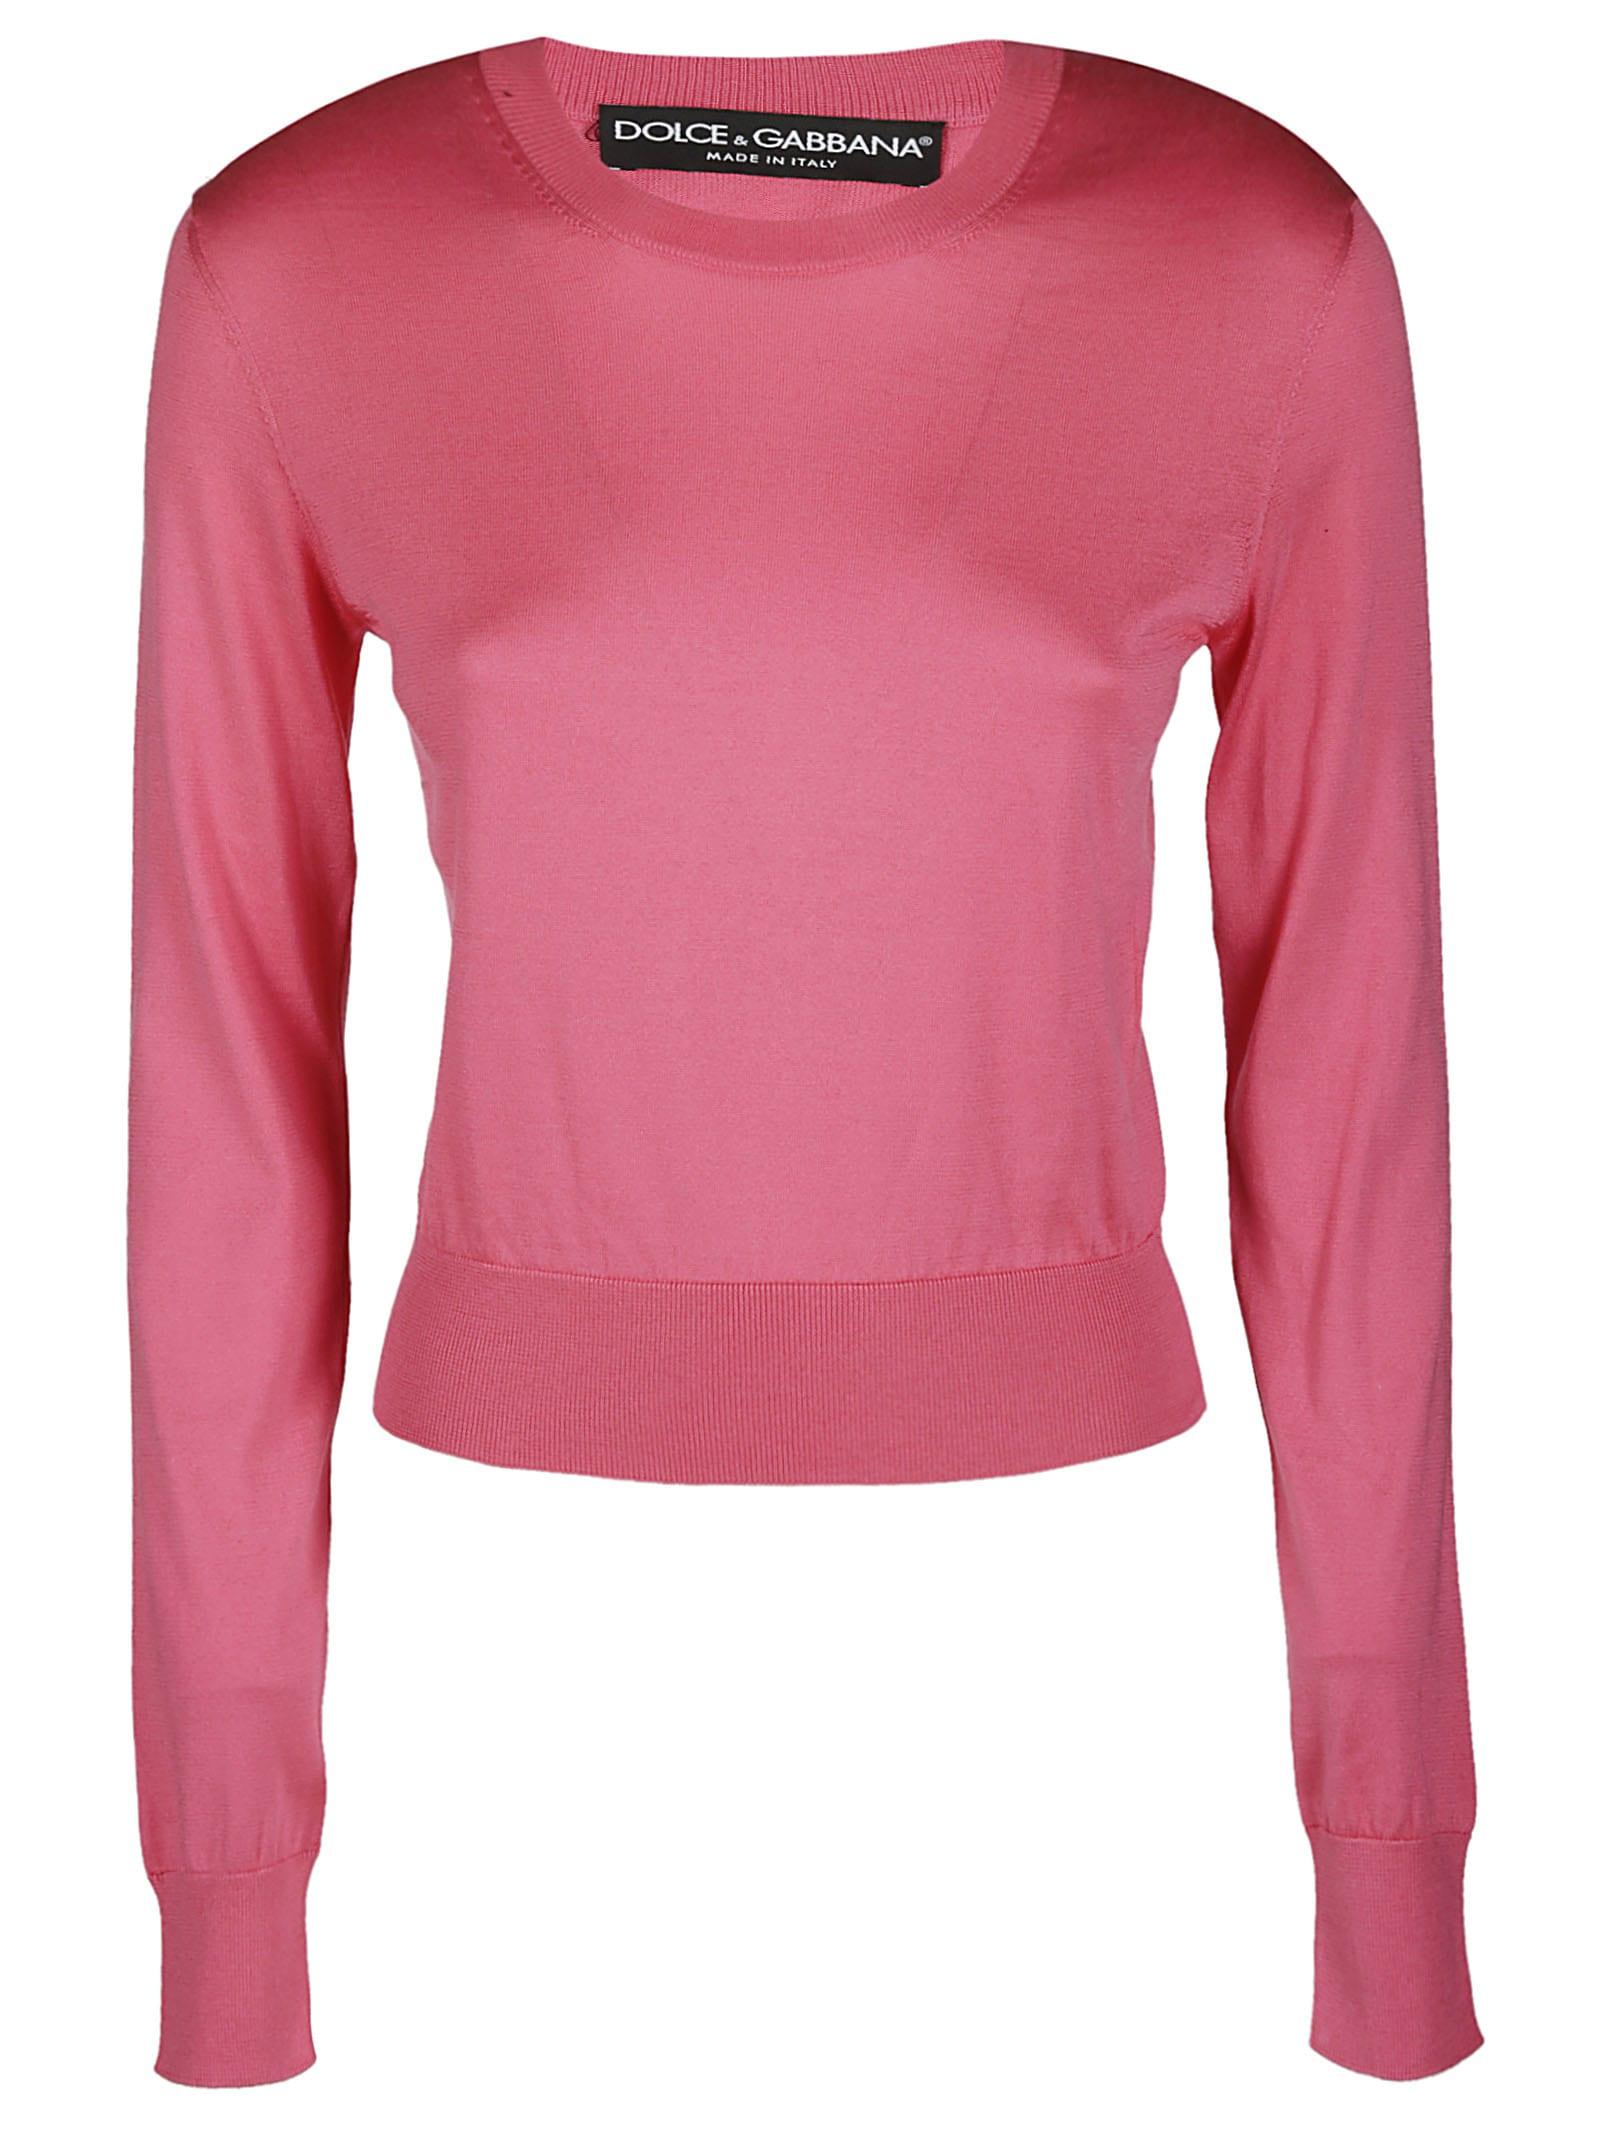 Dolce & Gabbana Pink Silk Jumper